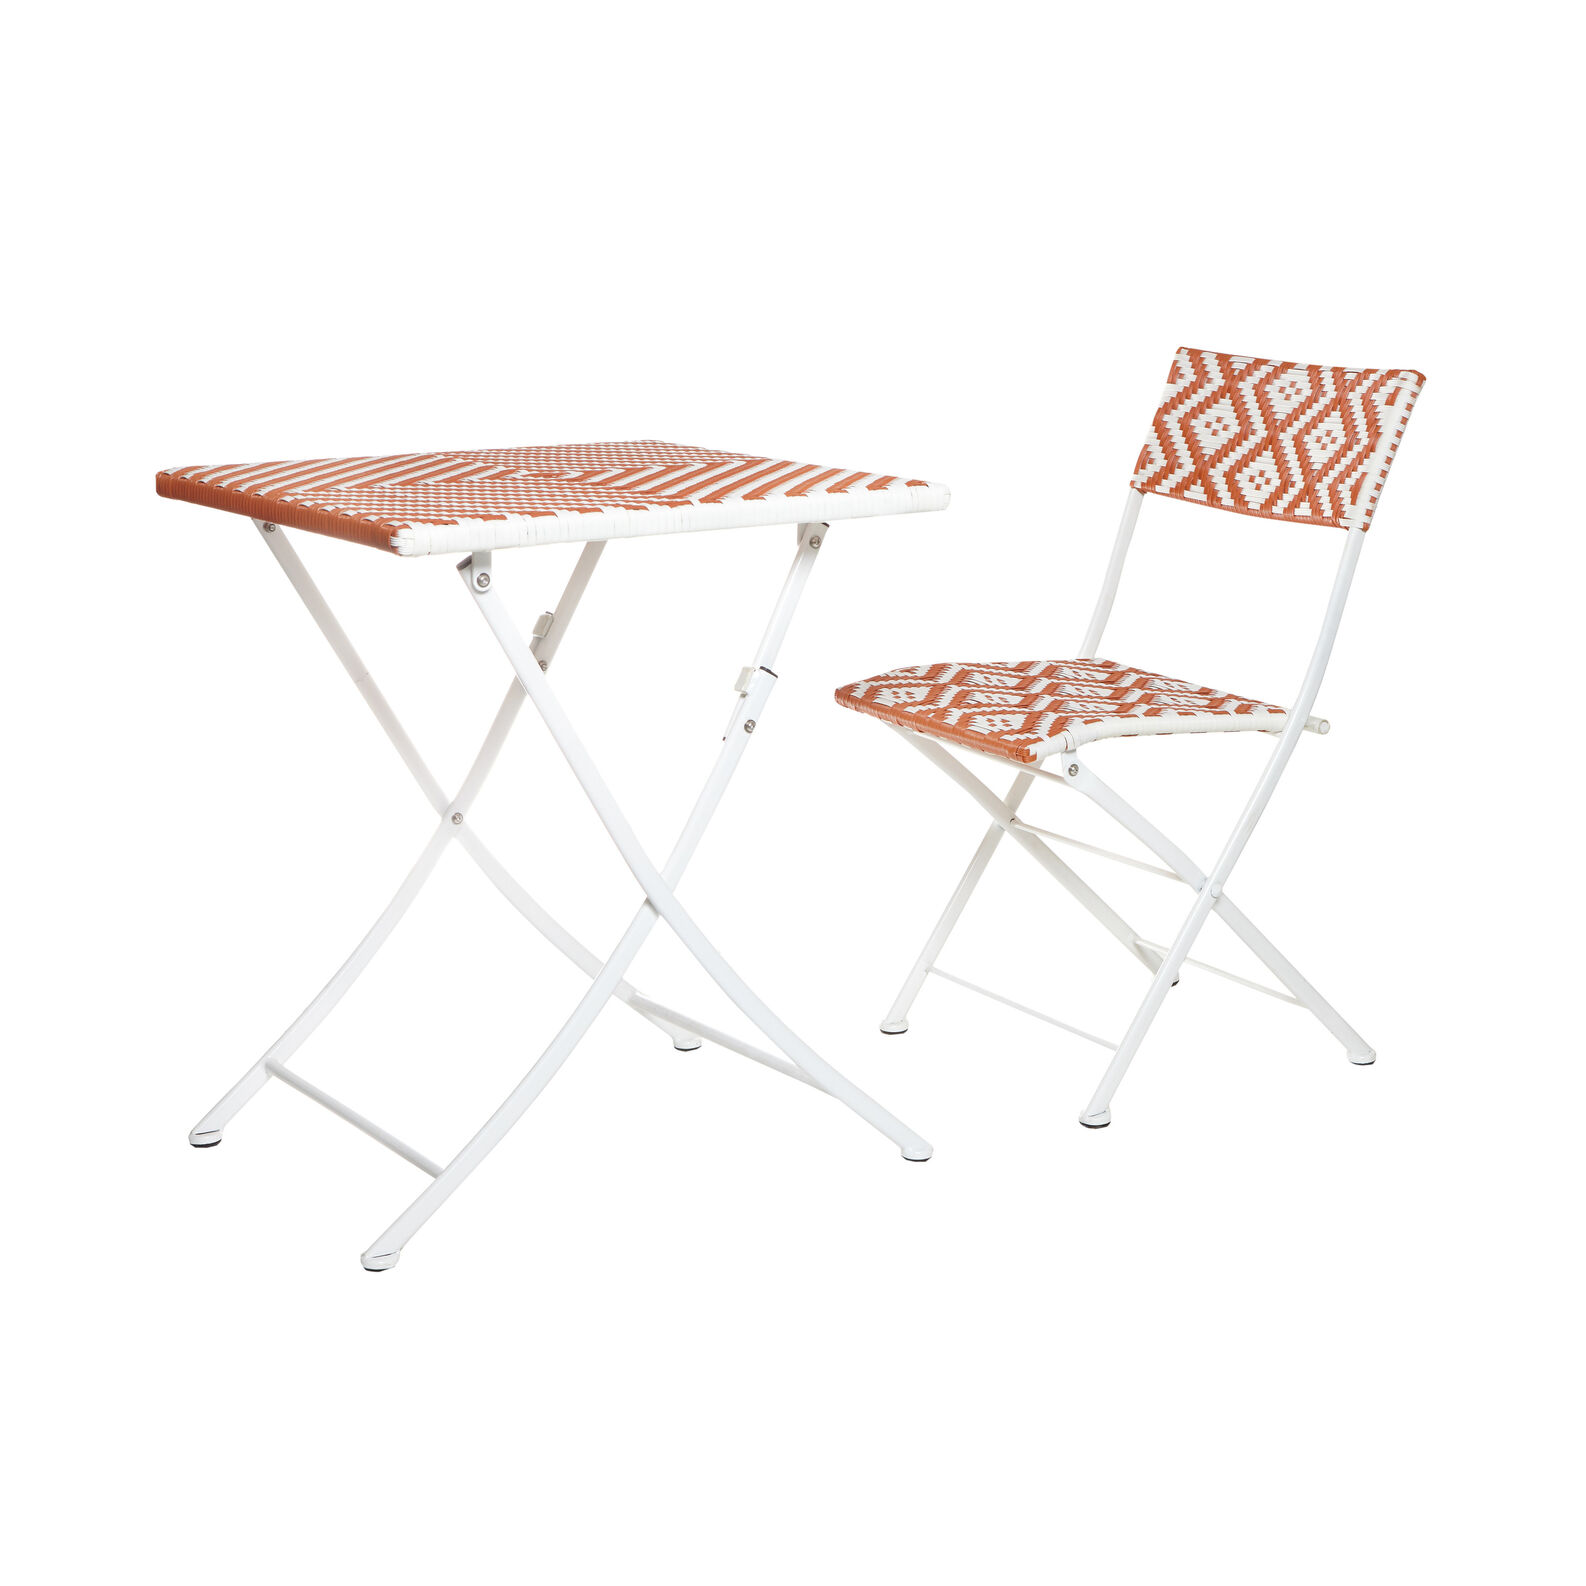 Playacarmen folding chair in polyrattan and aluminium